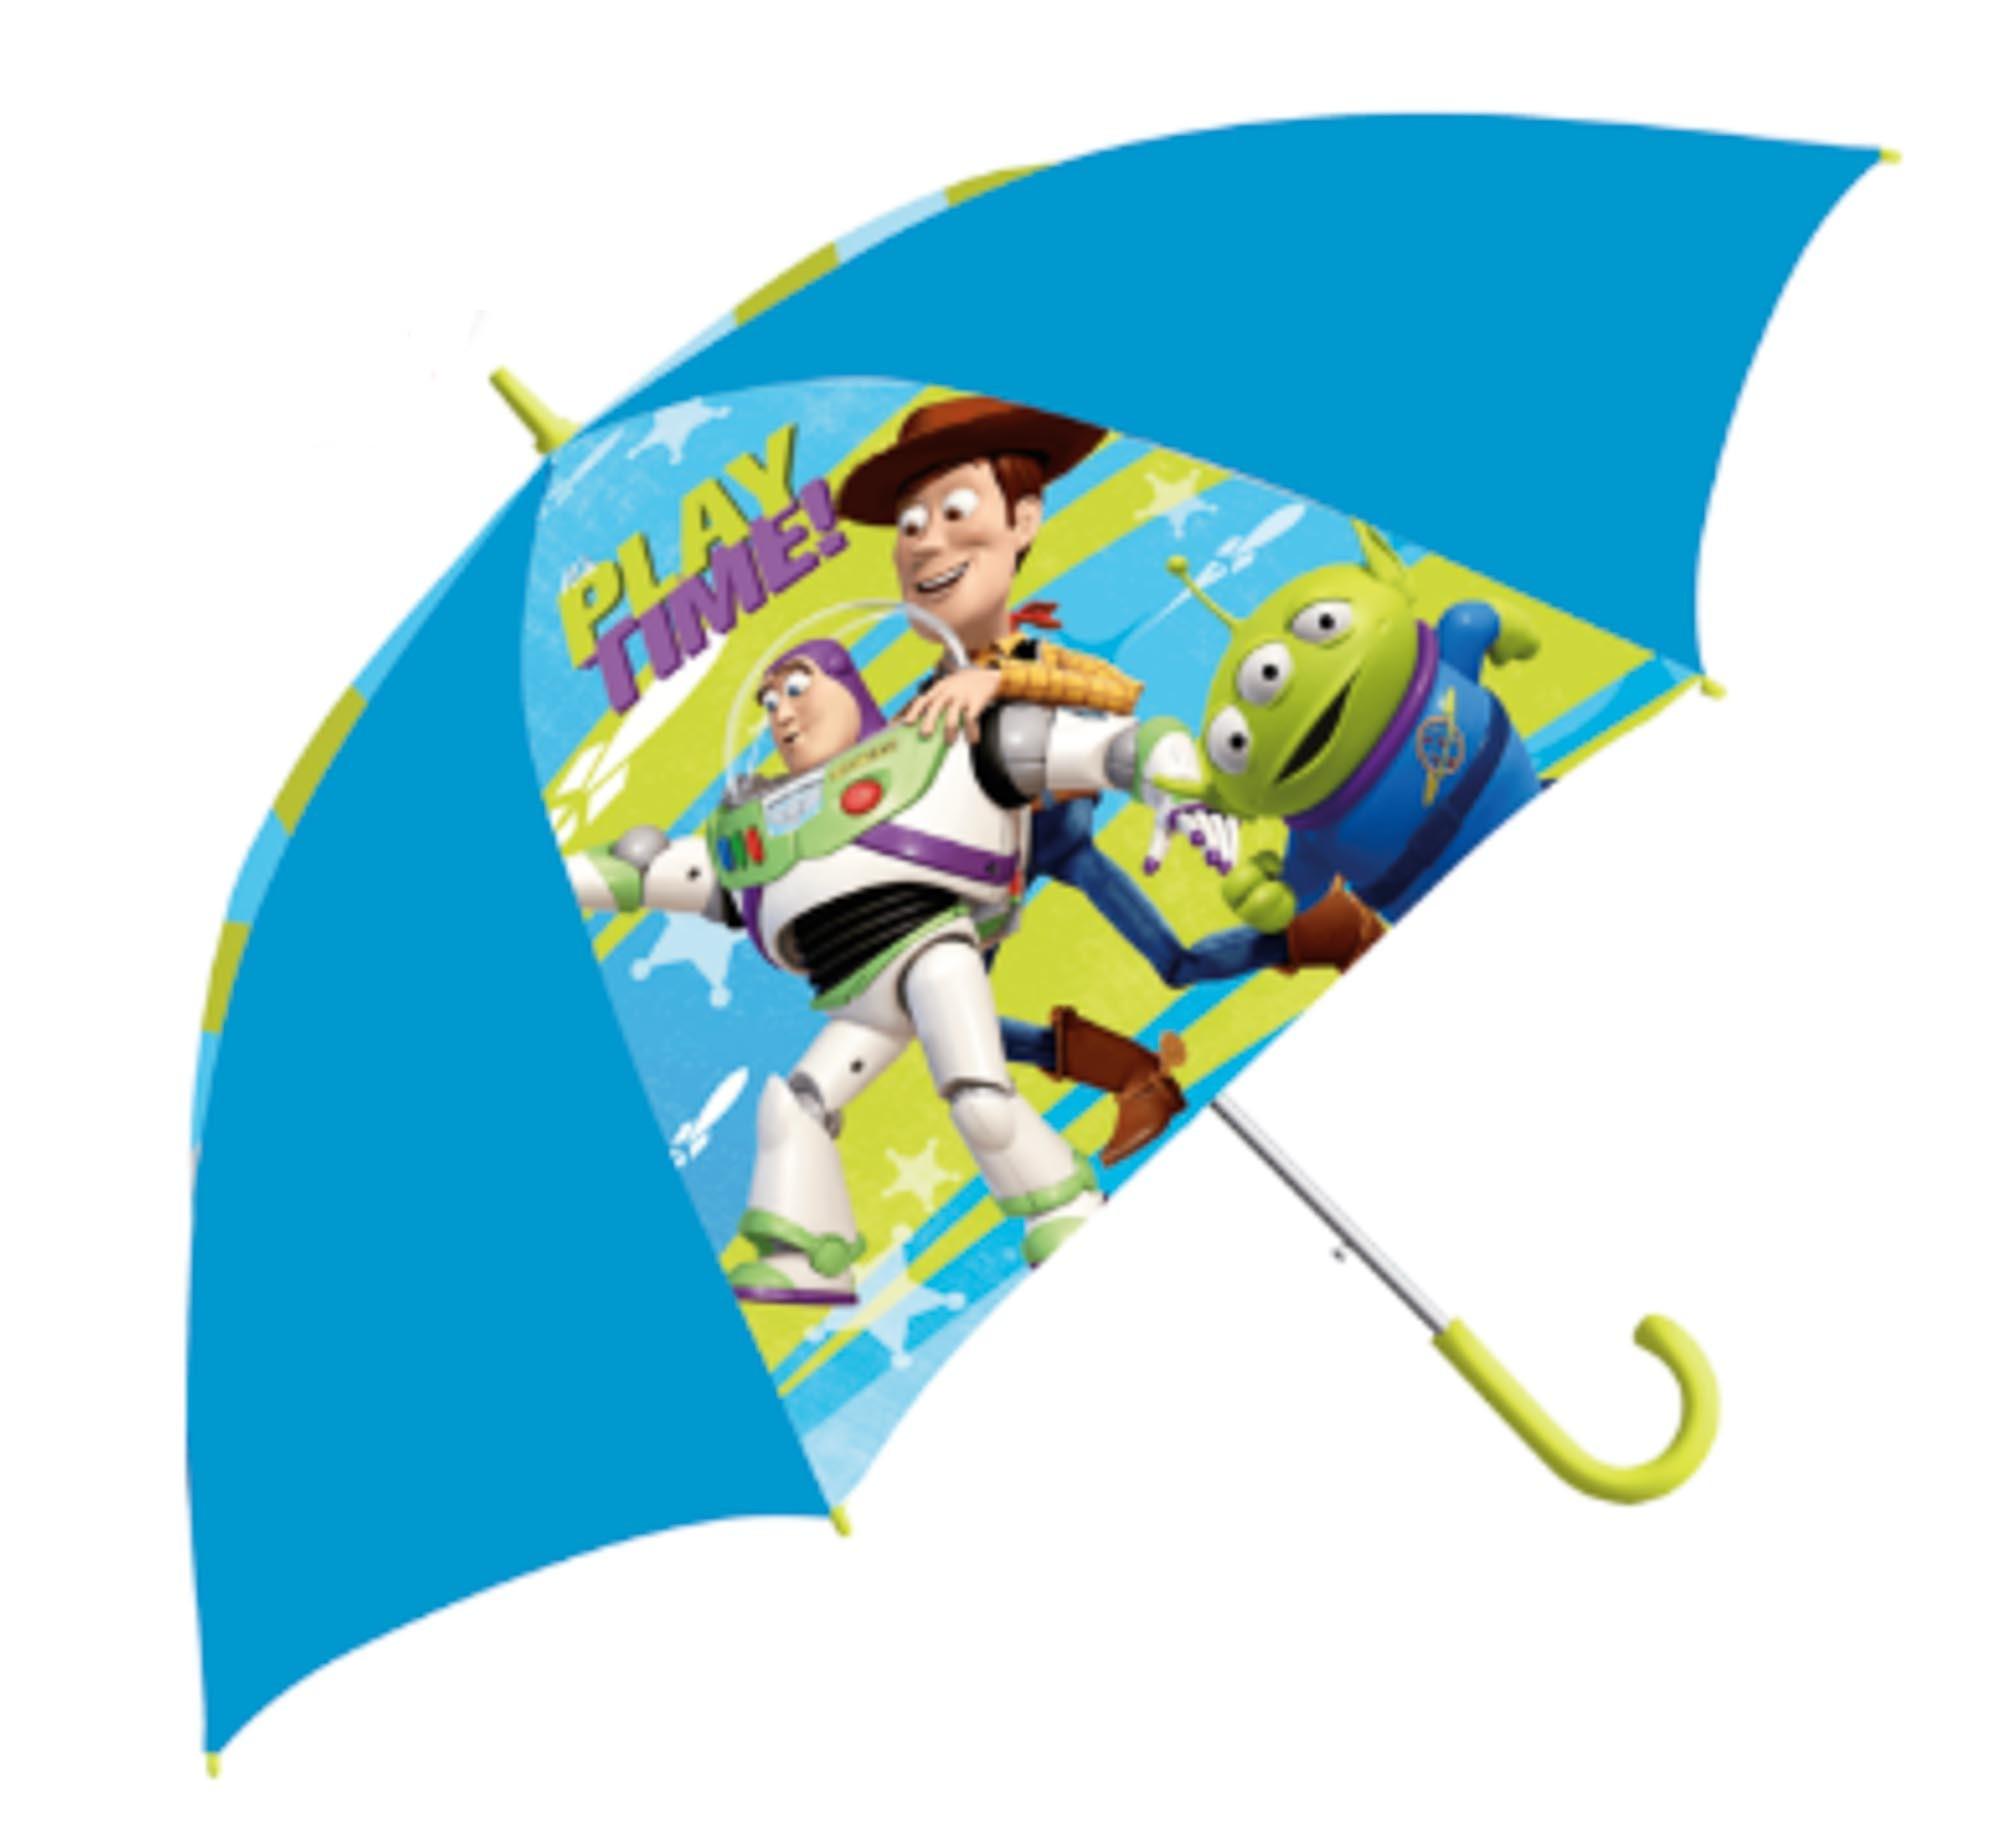 Kids umbrellas are half price at The Entertainer